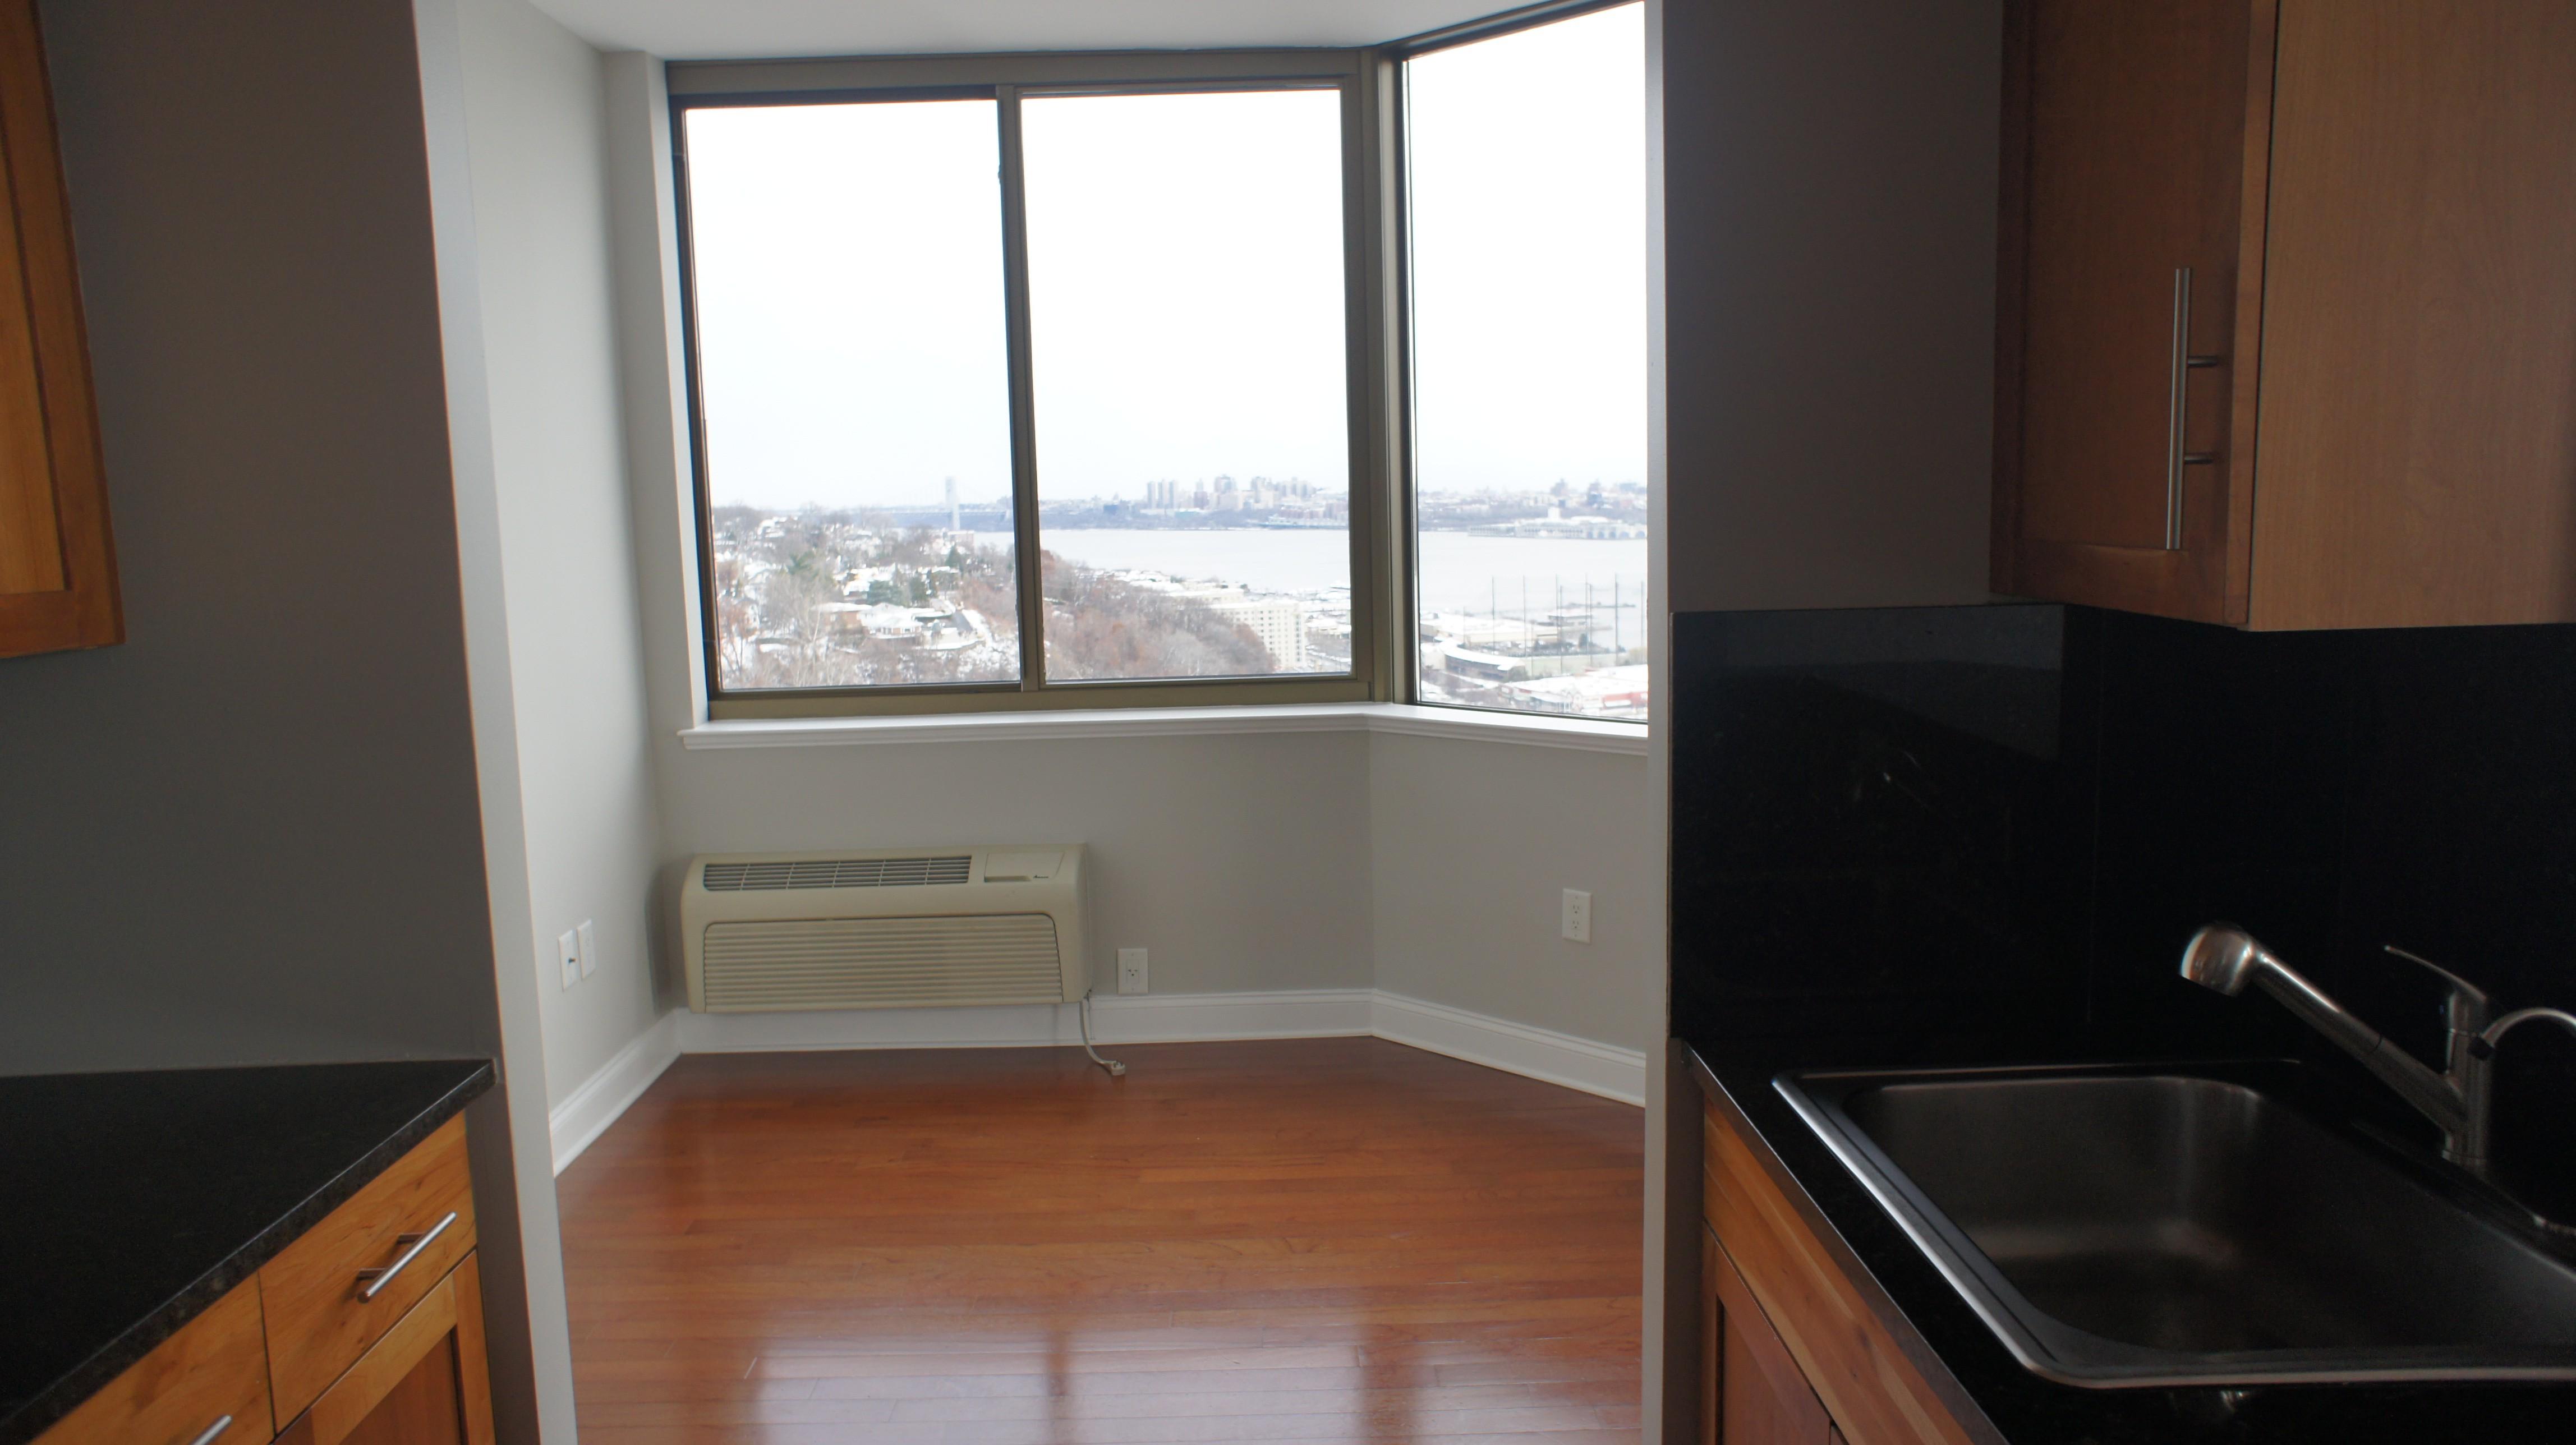 95 gorge rd 4269 edgewater nj 07020 1 bedroom apartment for 105 lighthouse terrace edgewater nj 07020